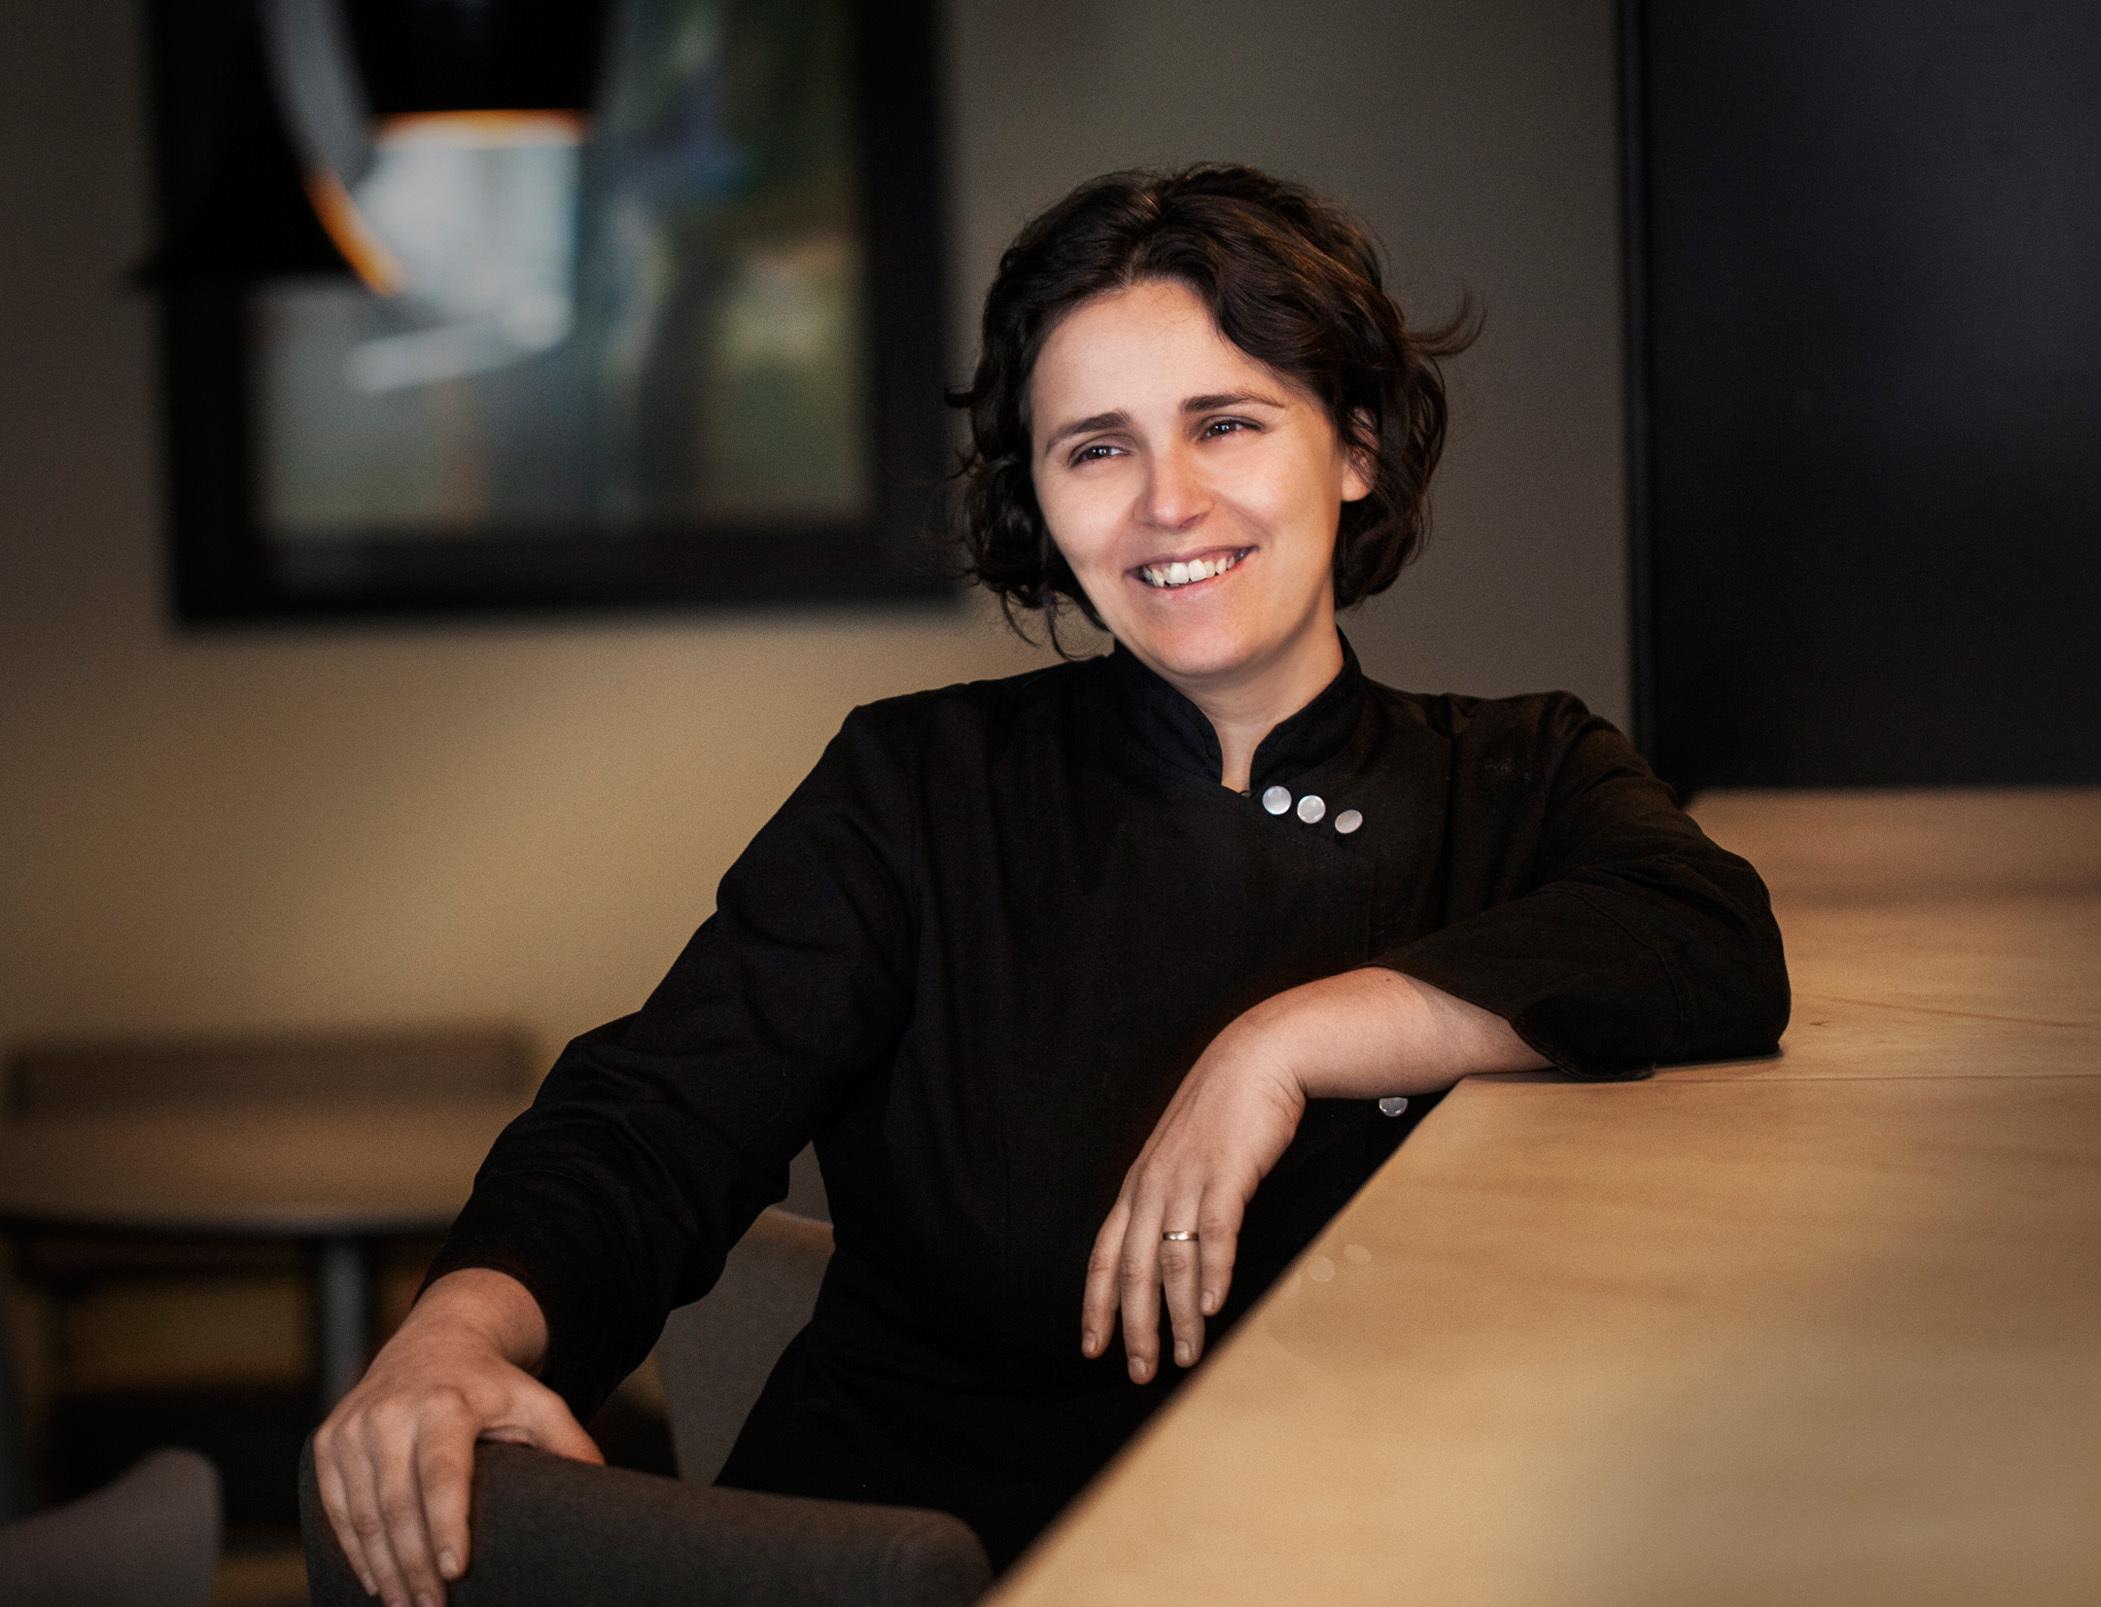 Chef Marlene Vieira